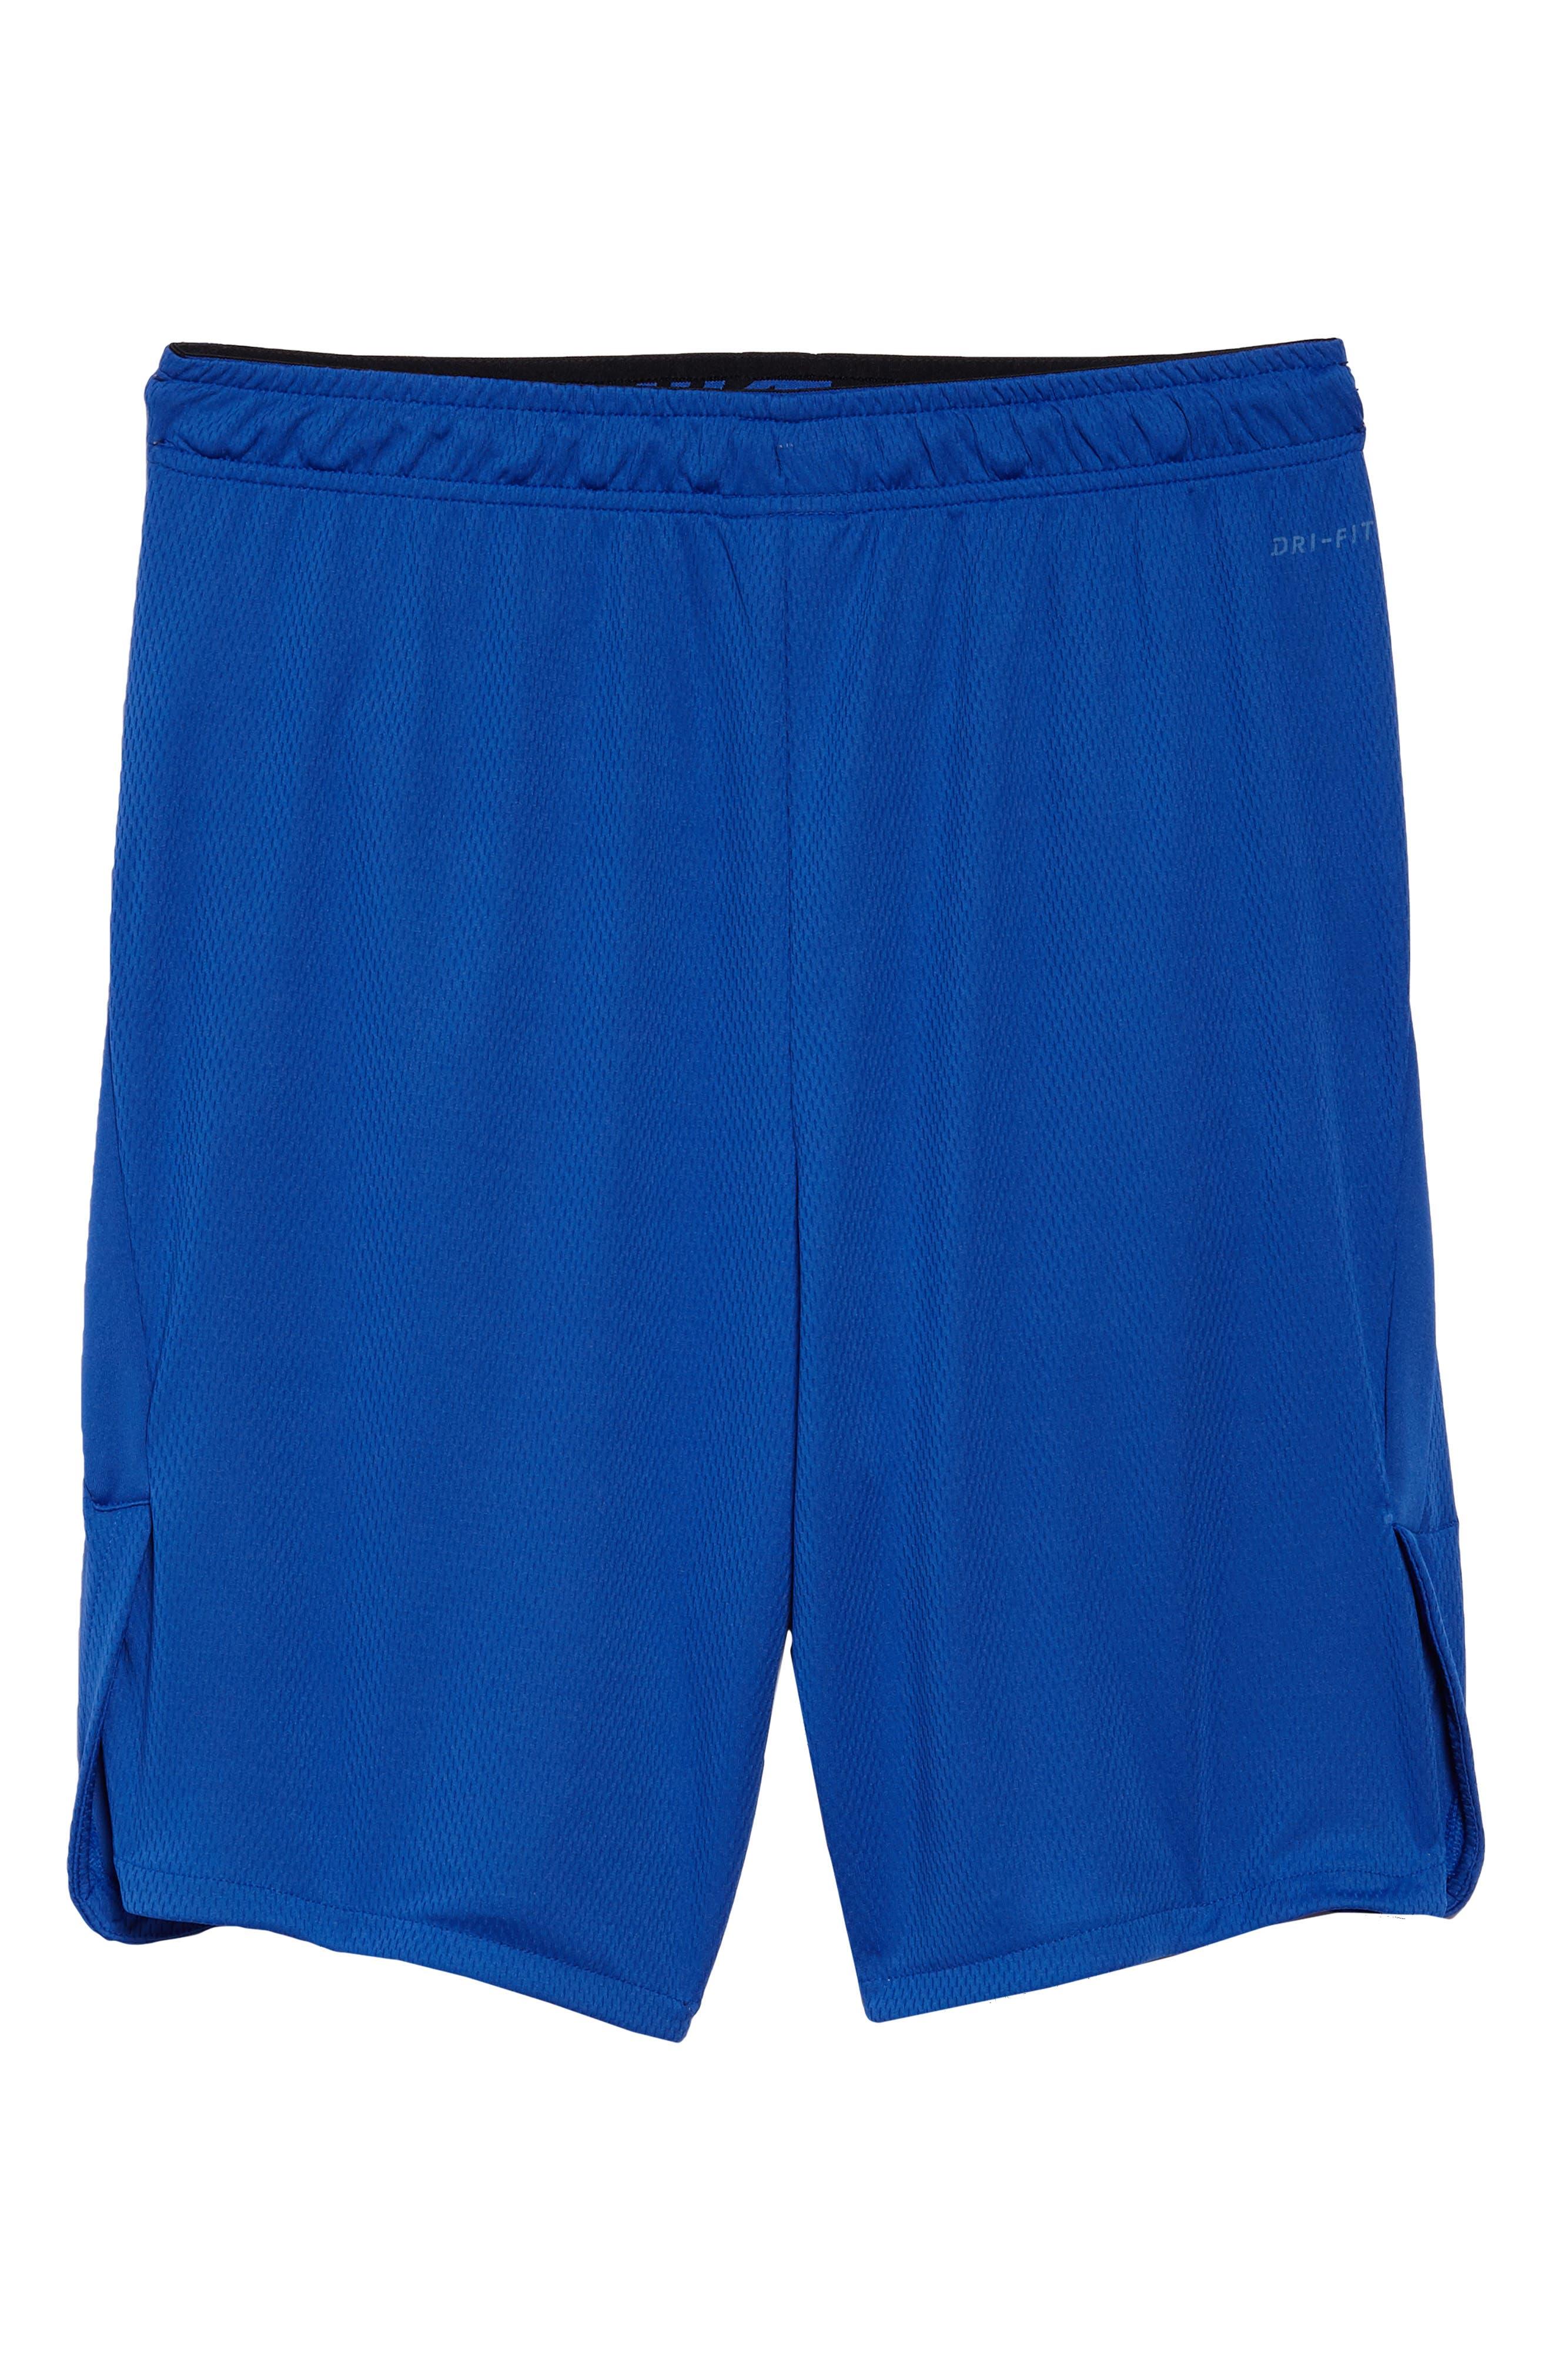 Training Dry 4.0 Shorts,                             Alternate thumbnail 33, color,